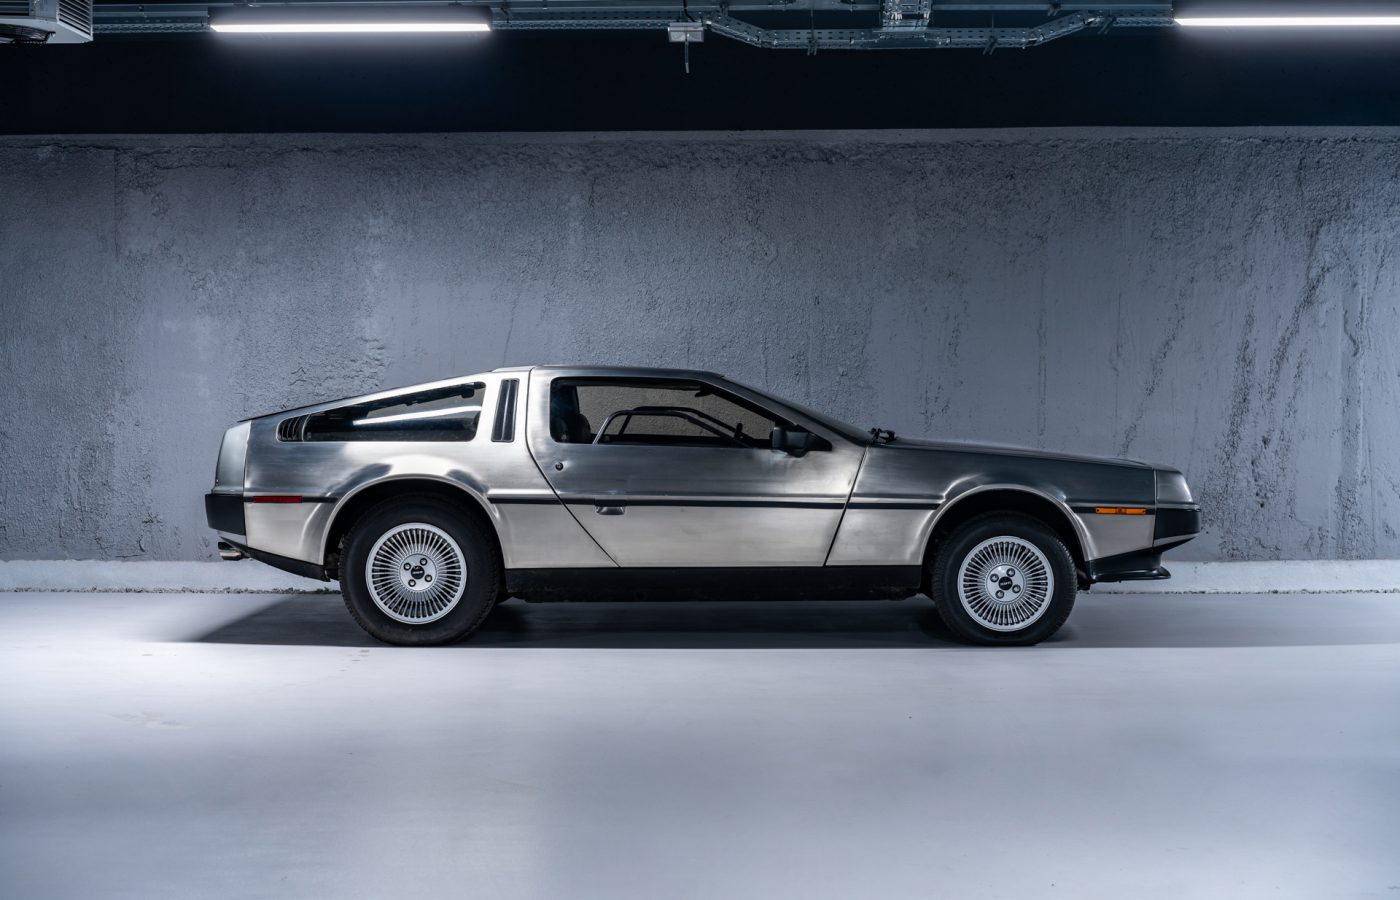 DeLorean DMC-13